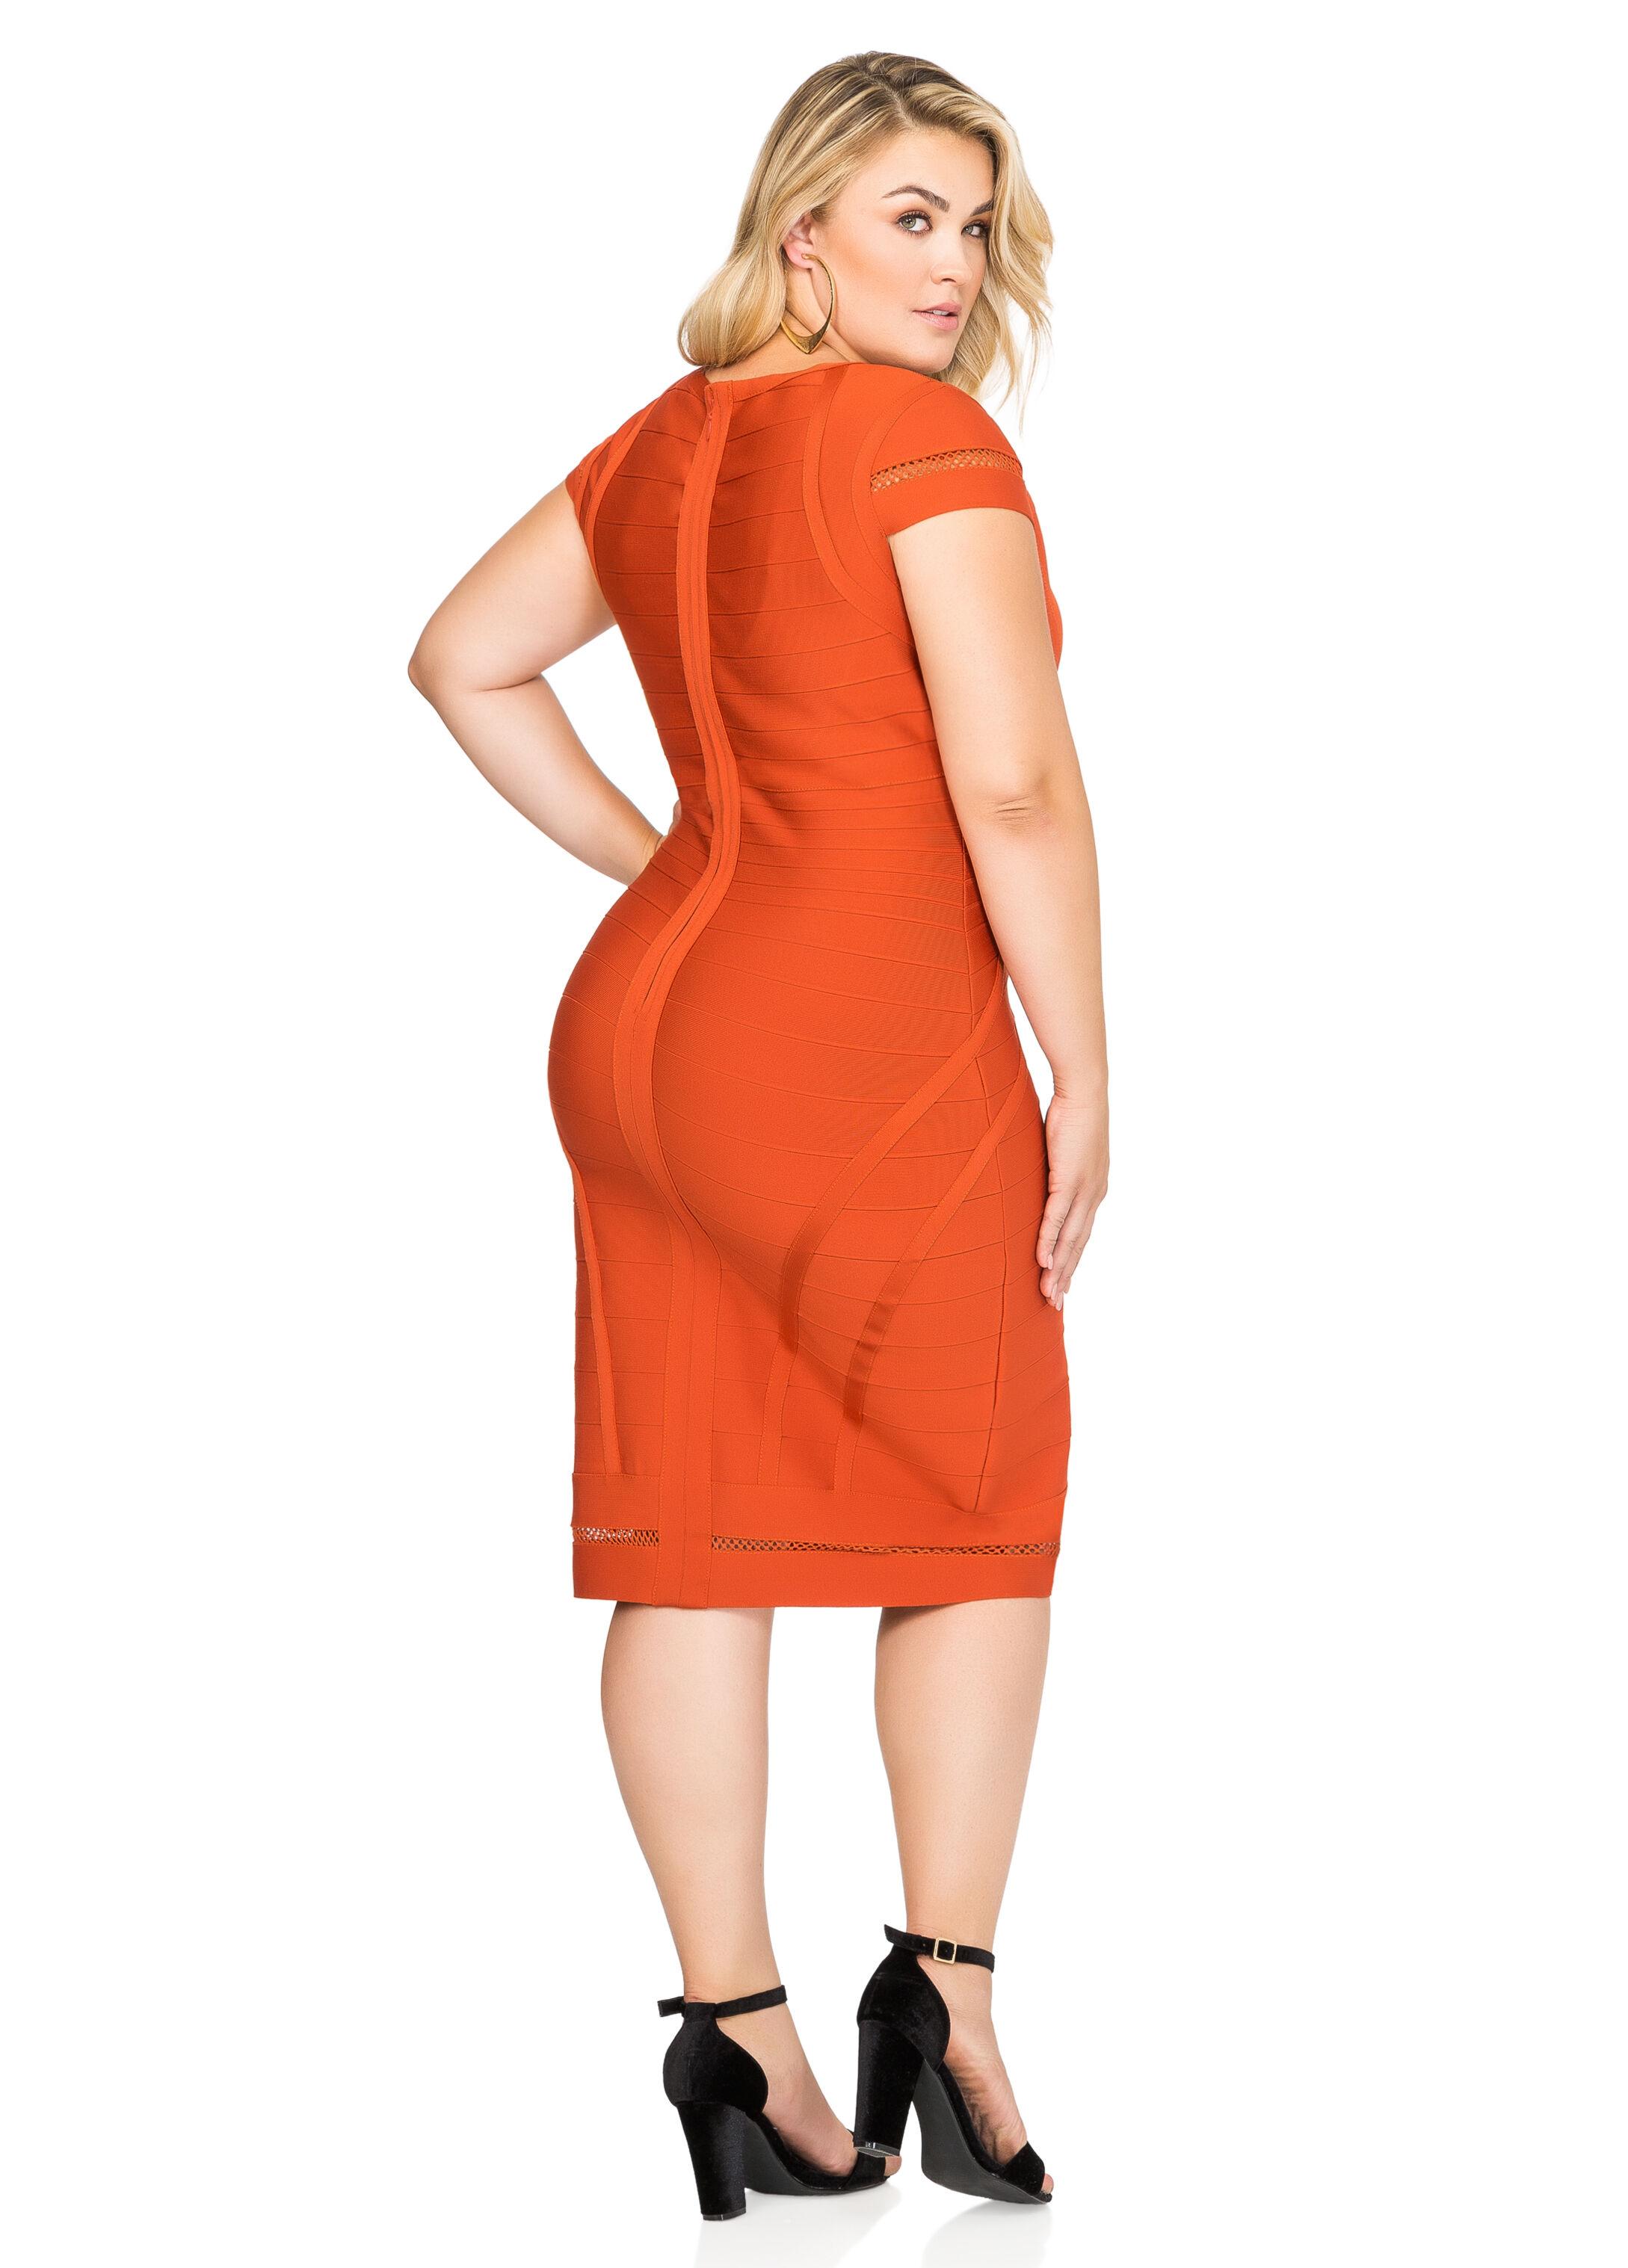 Mesh Trim Bodycon Bandage Dress